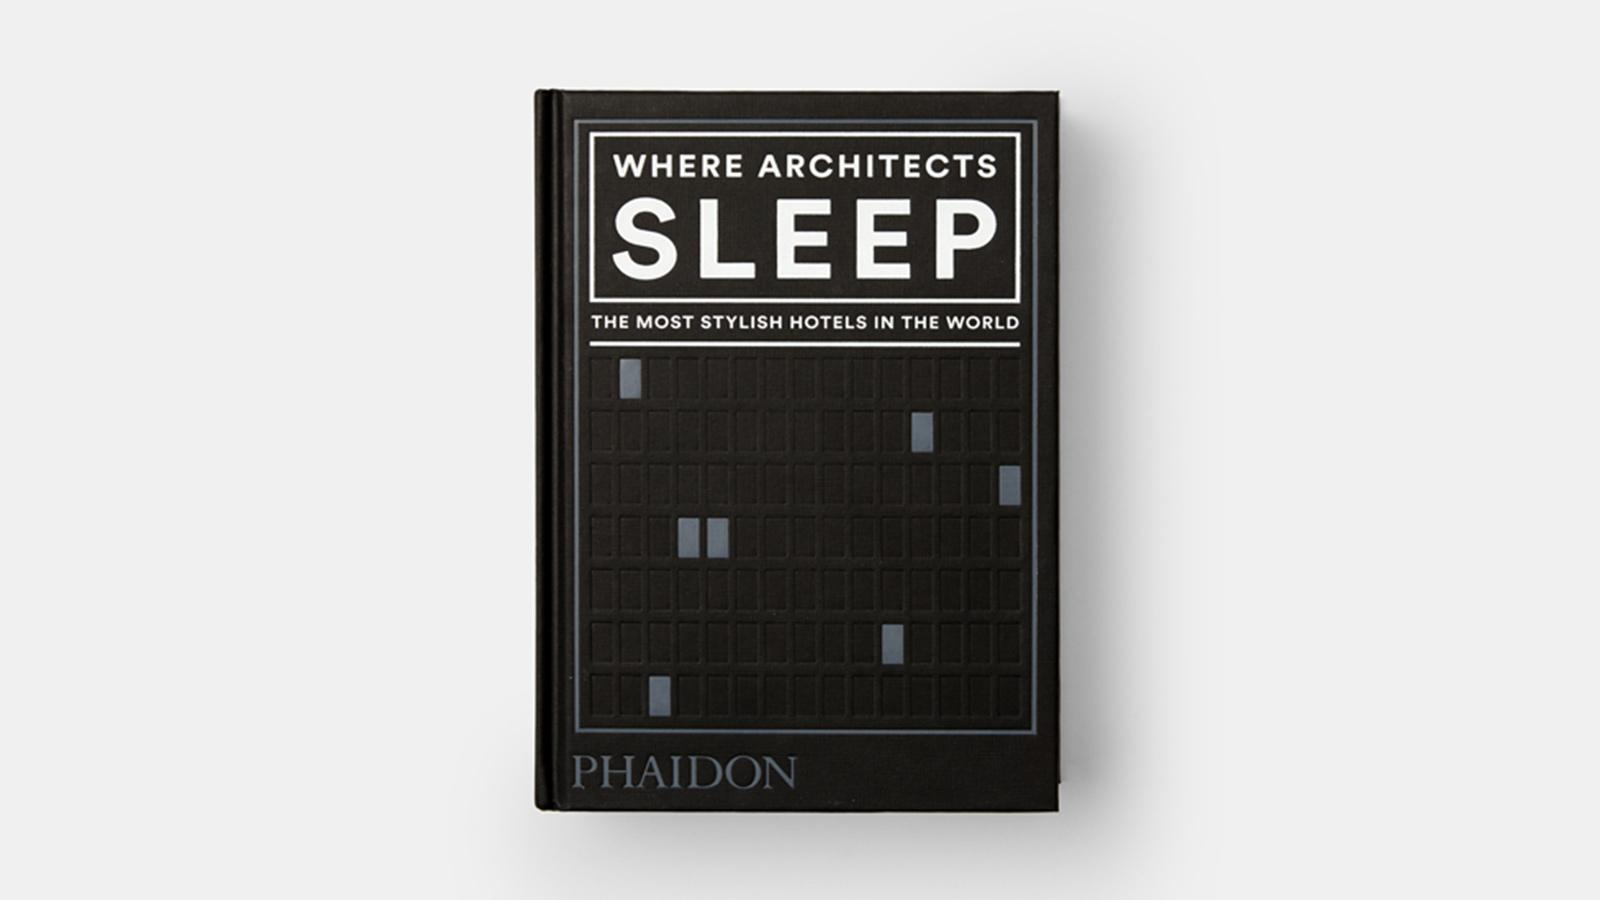 'Where Architects Sleep' by Sarah Miller